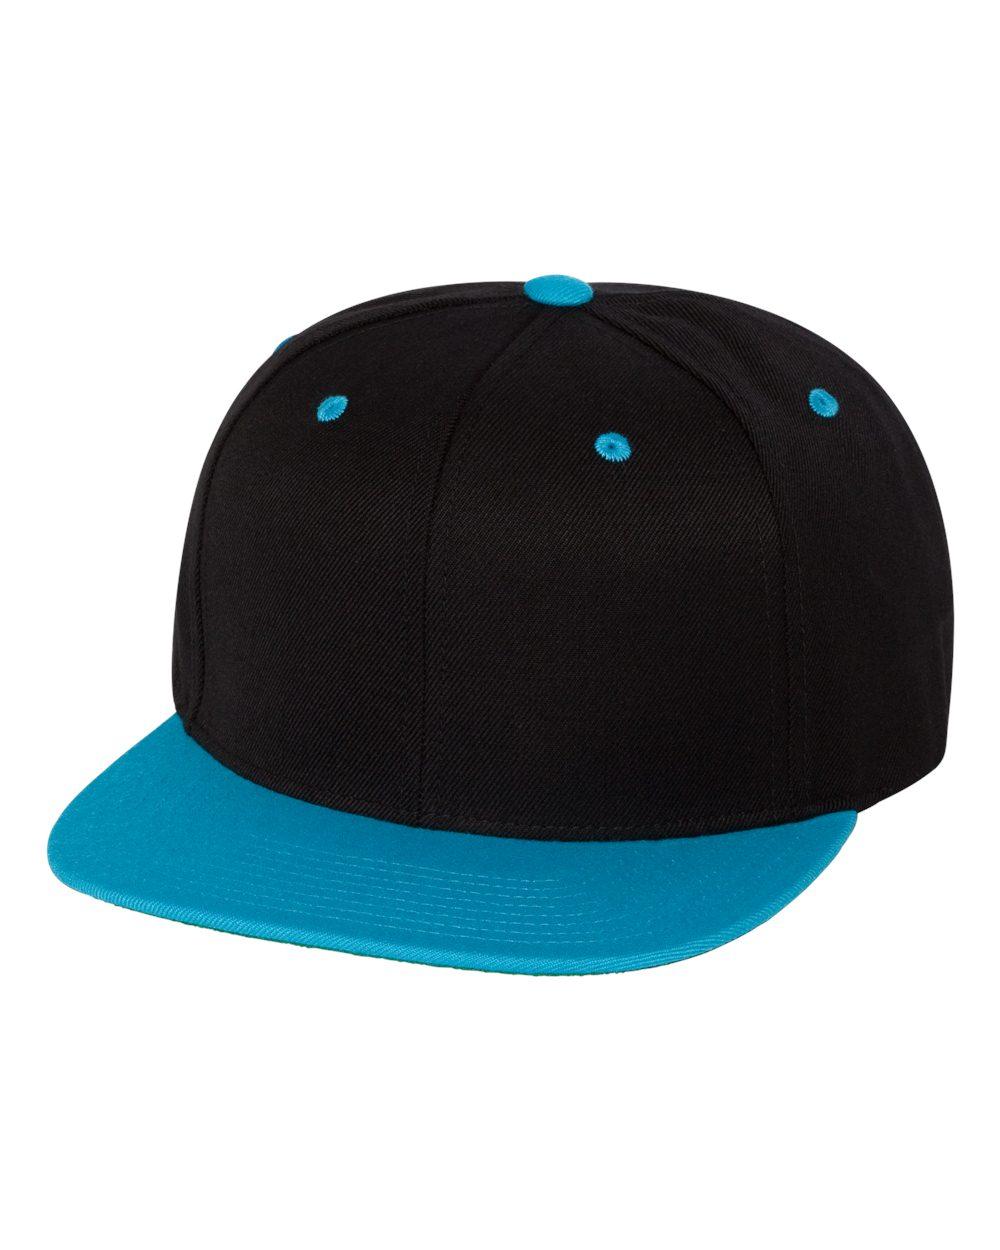 Flat Bill Caps